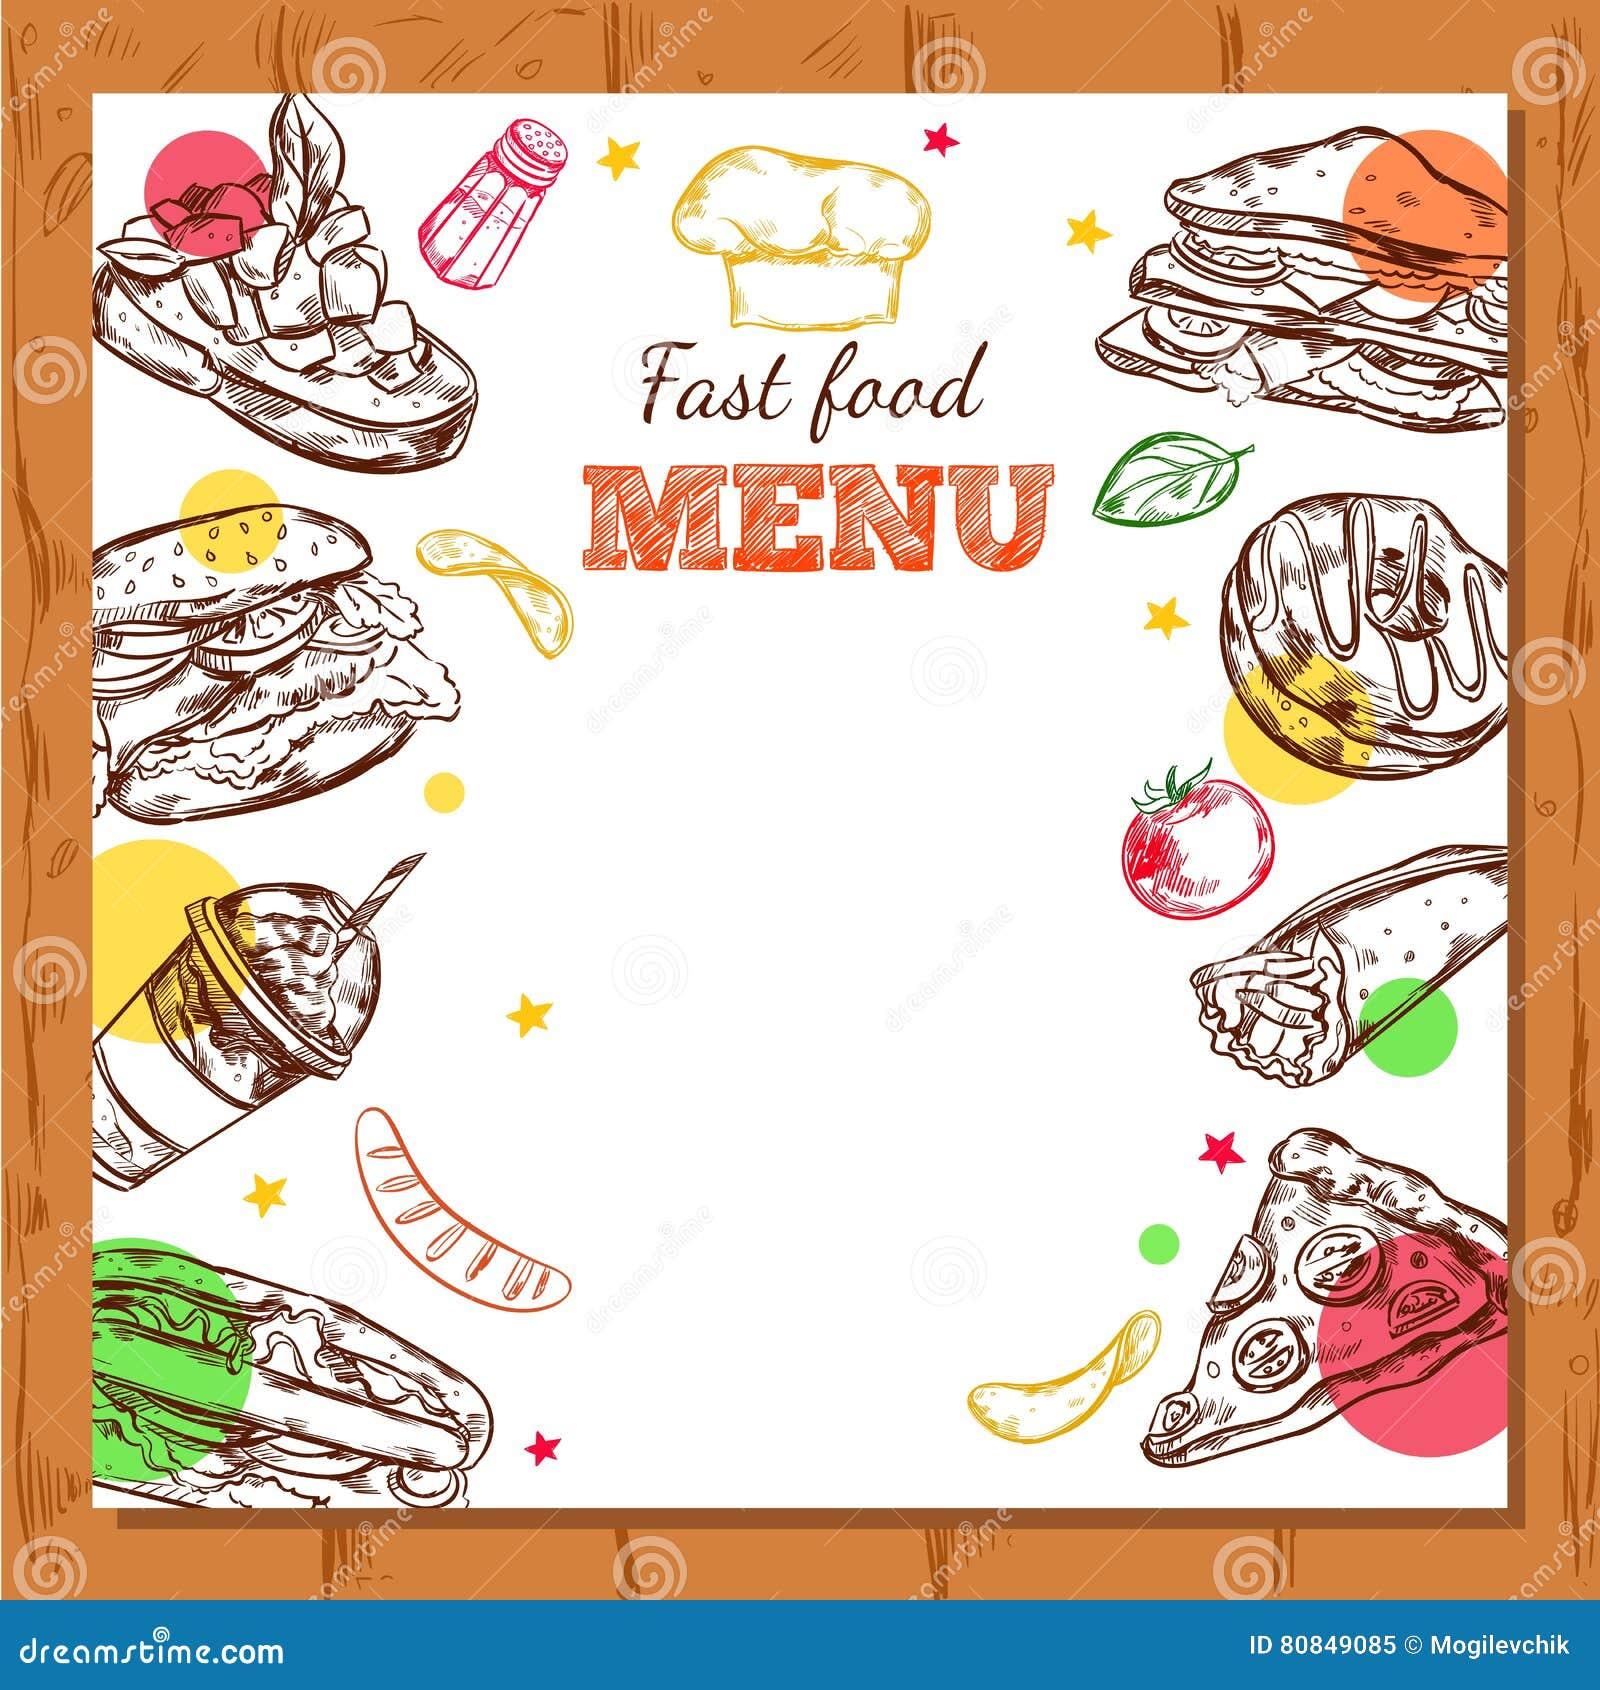 Fastfood Restaurant Menu Design Stock Vector Illustration Of Cover Creative 80849085